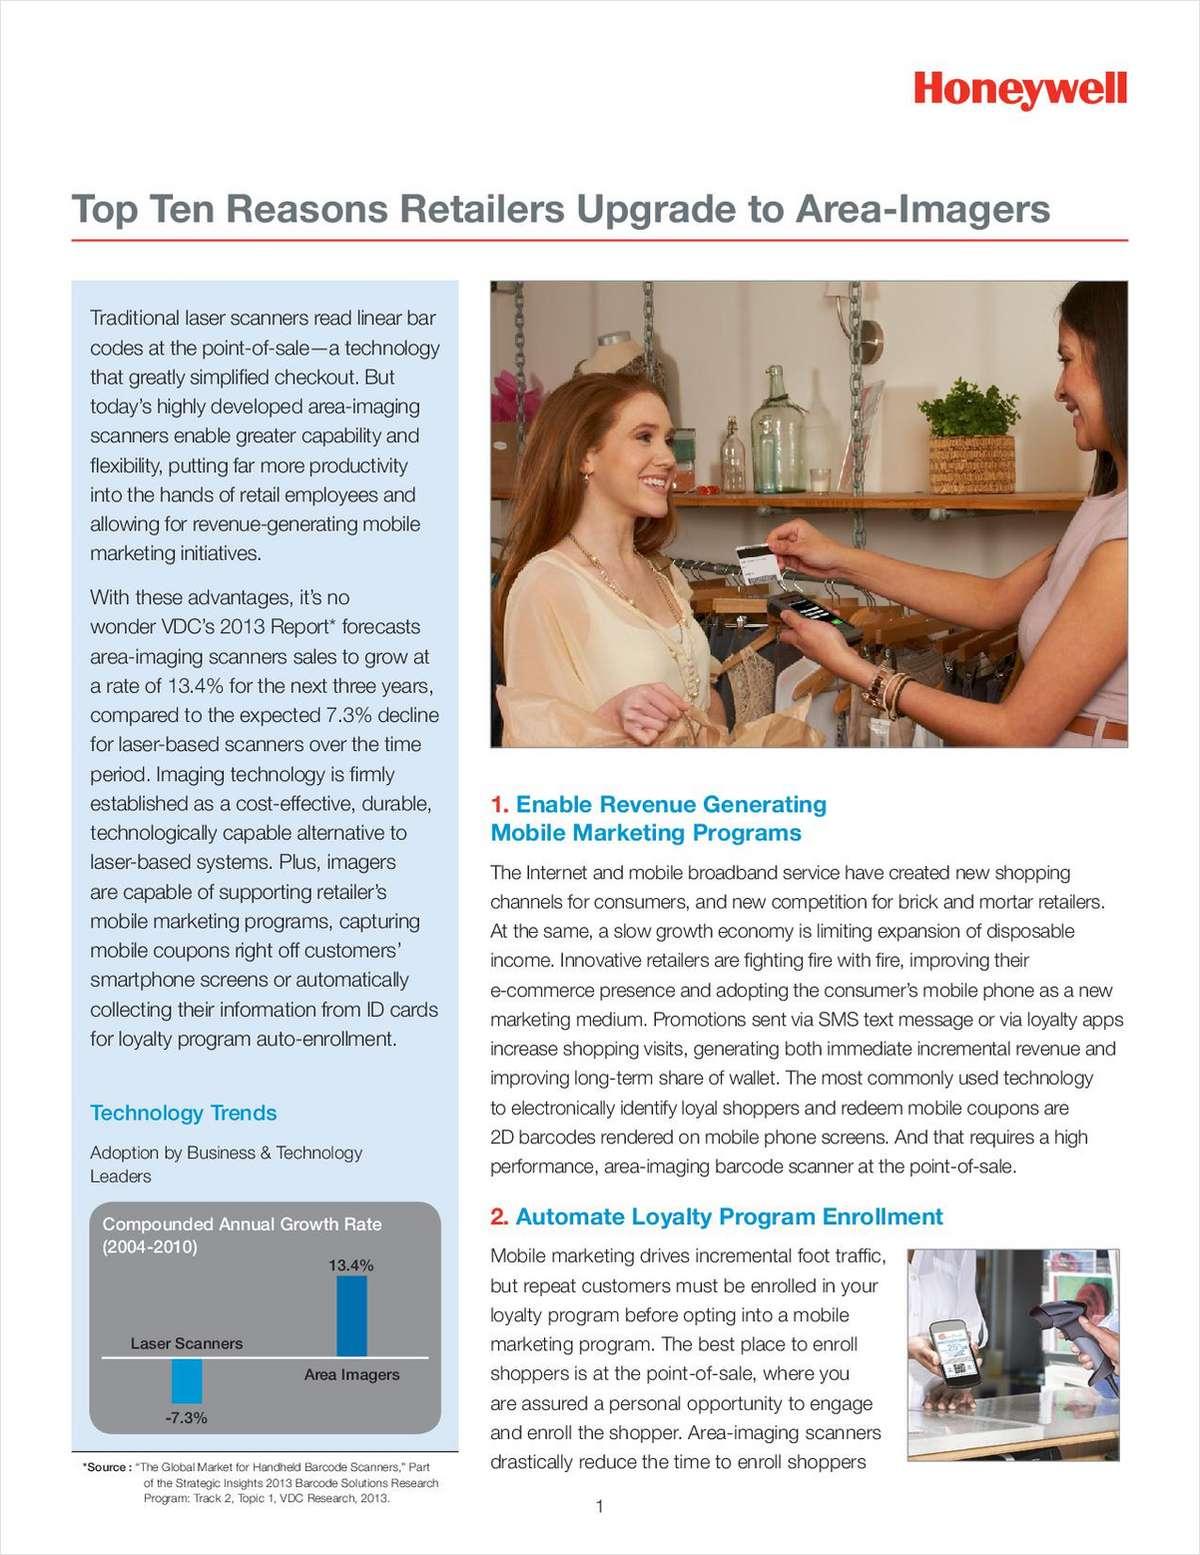 Top Ten Reasons Retailers Upgrade to Area-Imagers